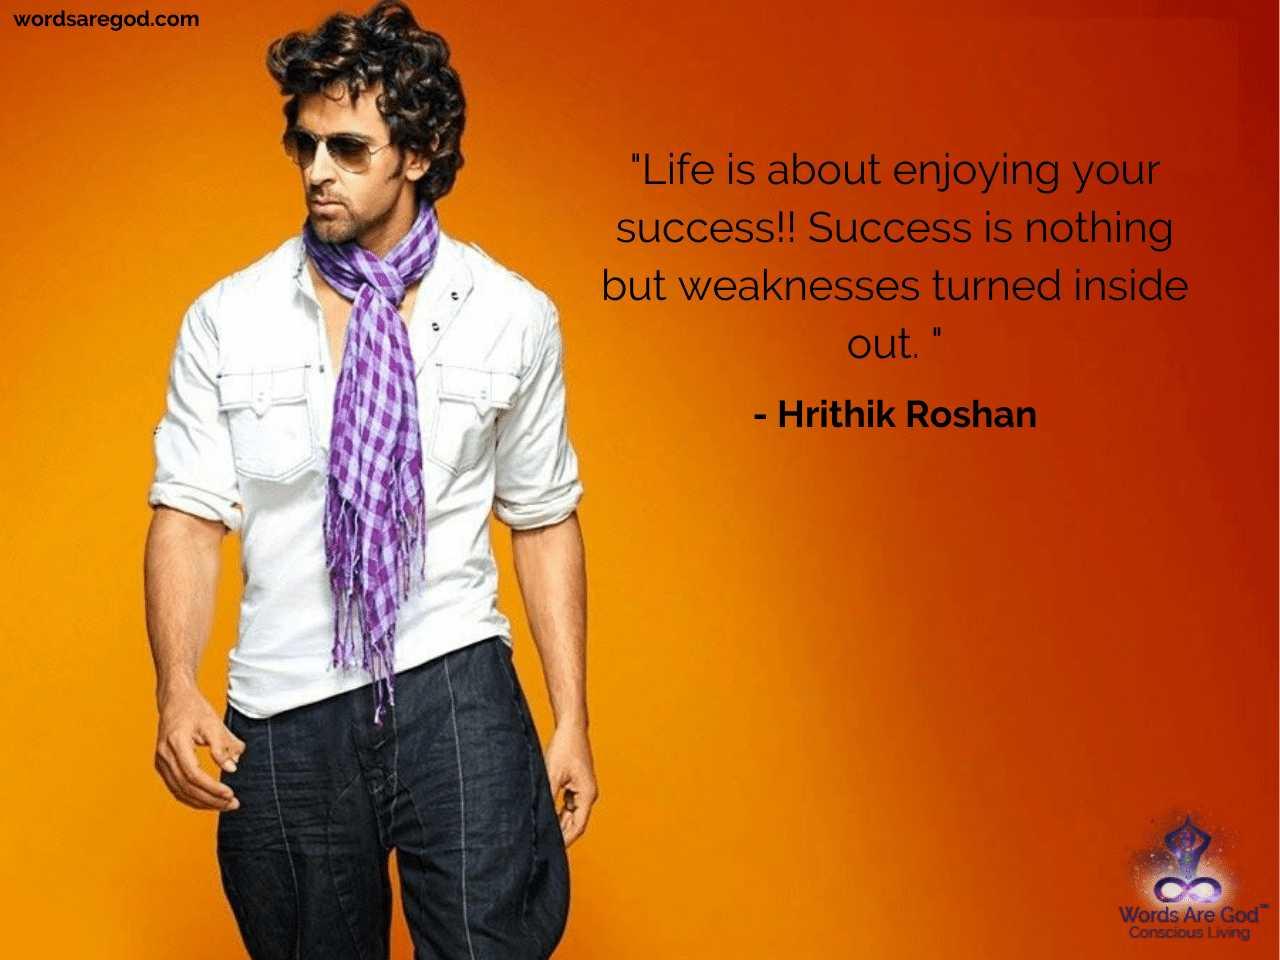 Hrithik Roshan Life Quotes